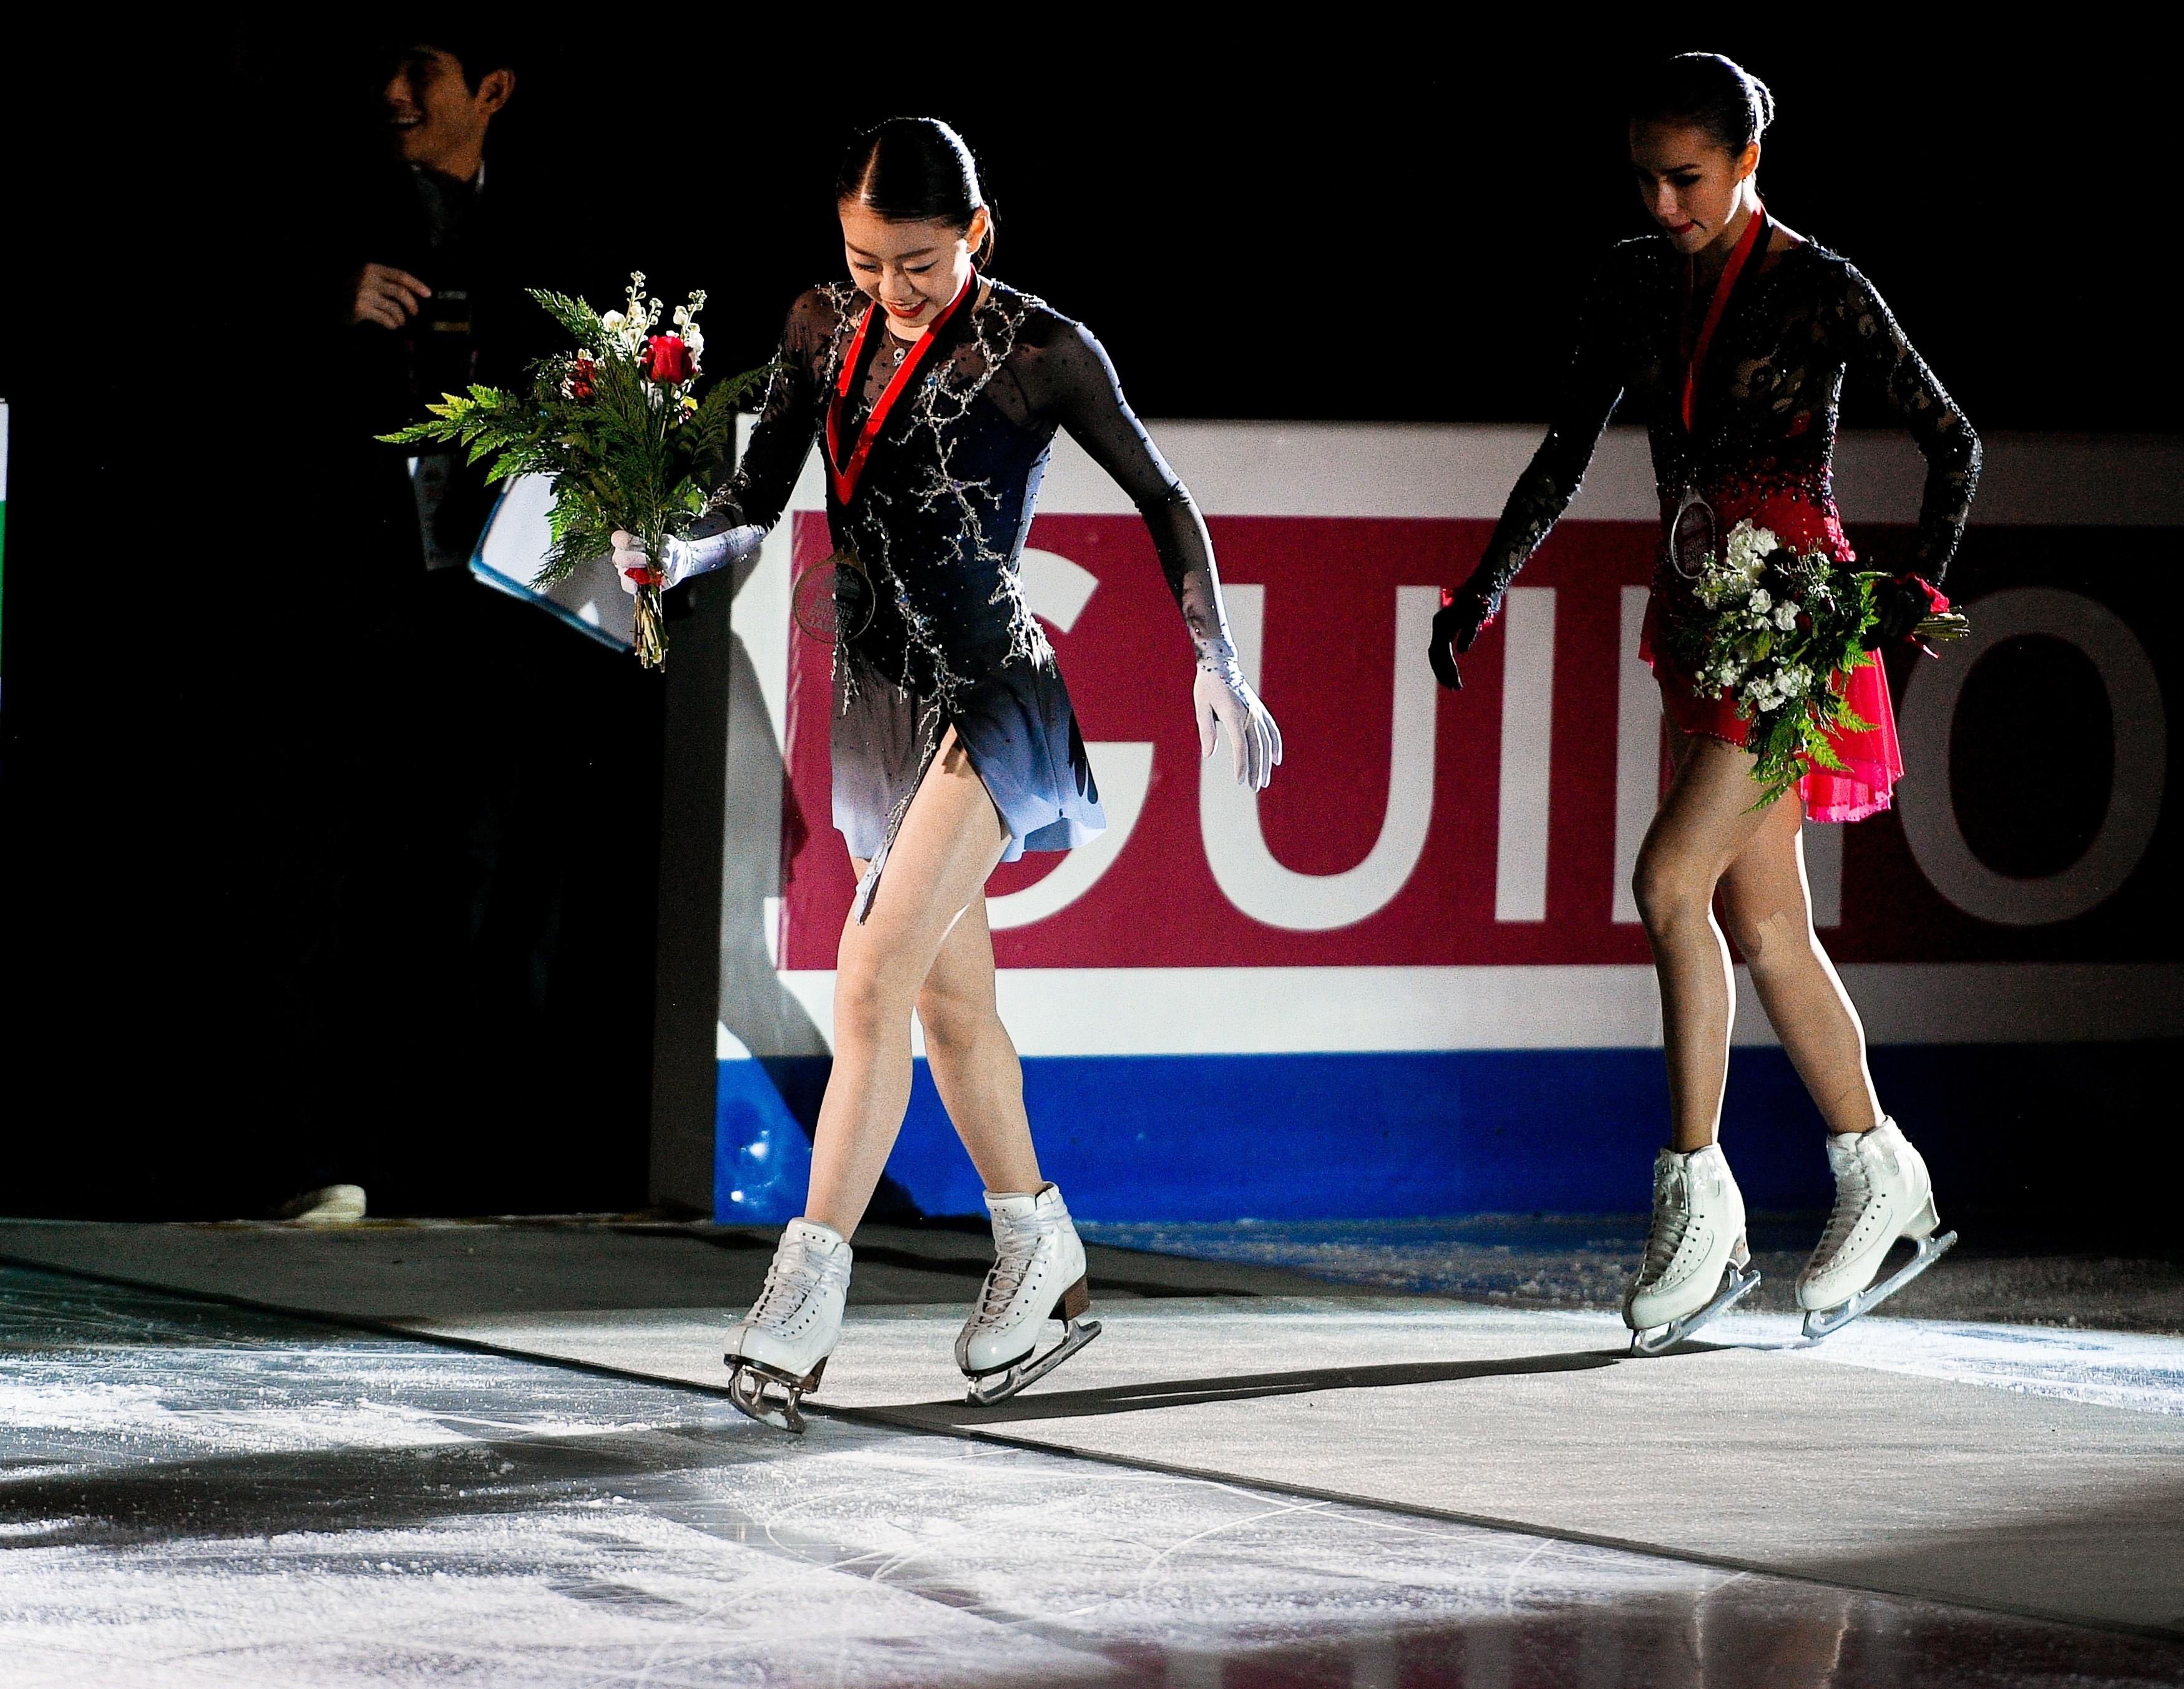 В финале Гран-при Загитова оказалась в тени Кихиры. Фото: © РИА Новости / Александр Вильф